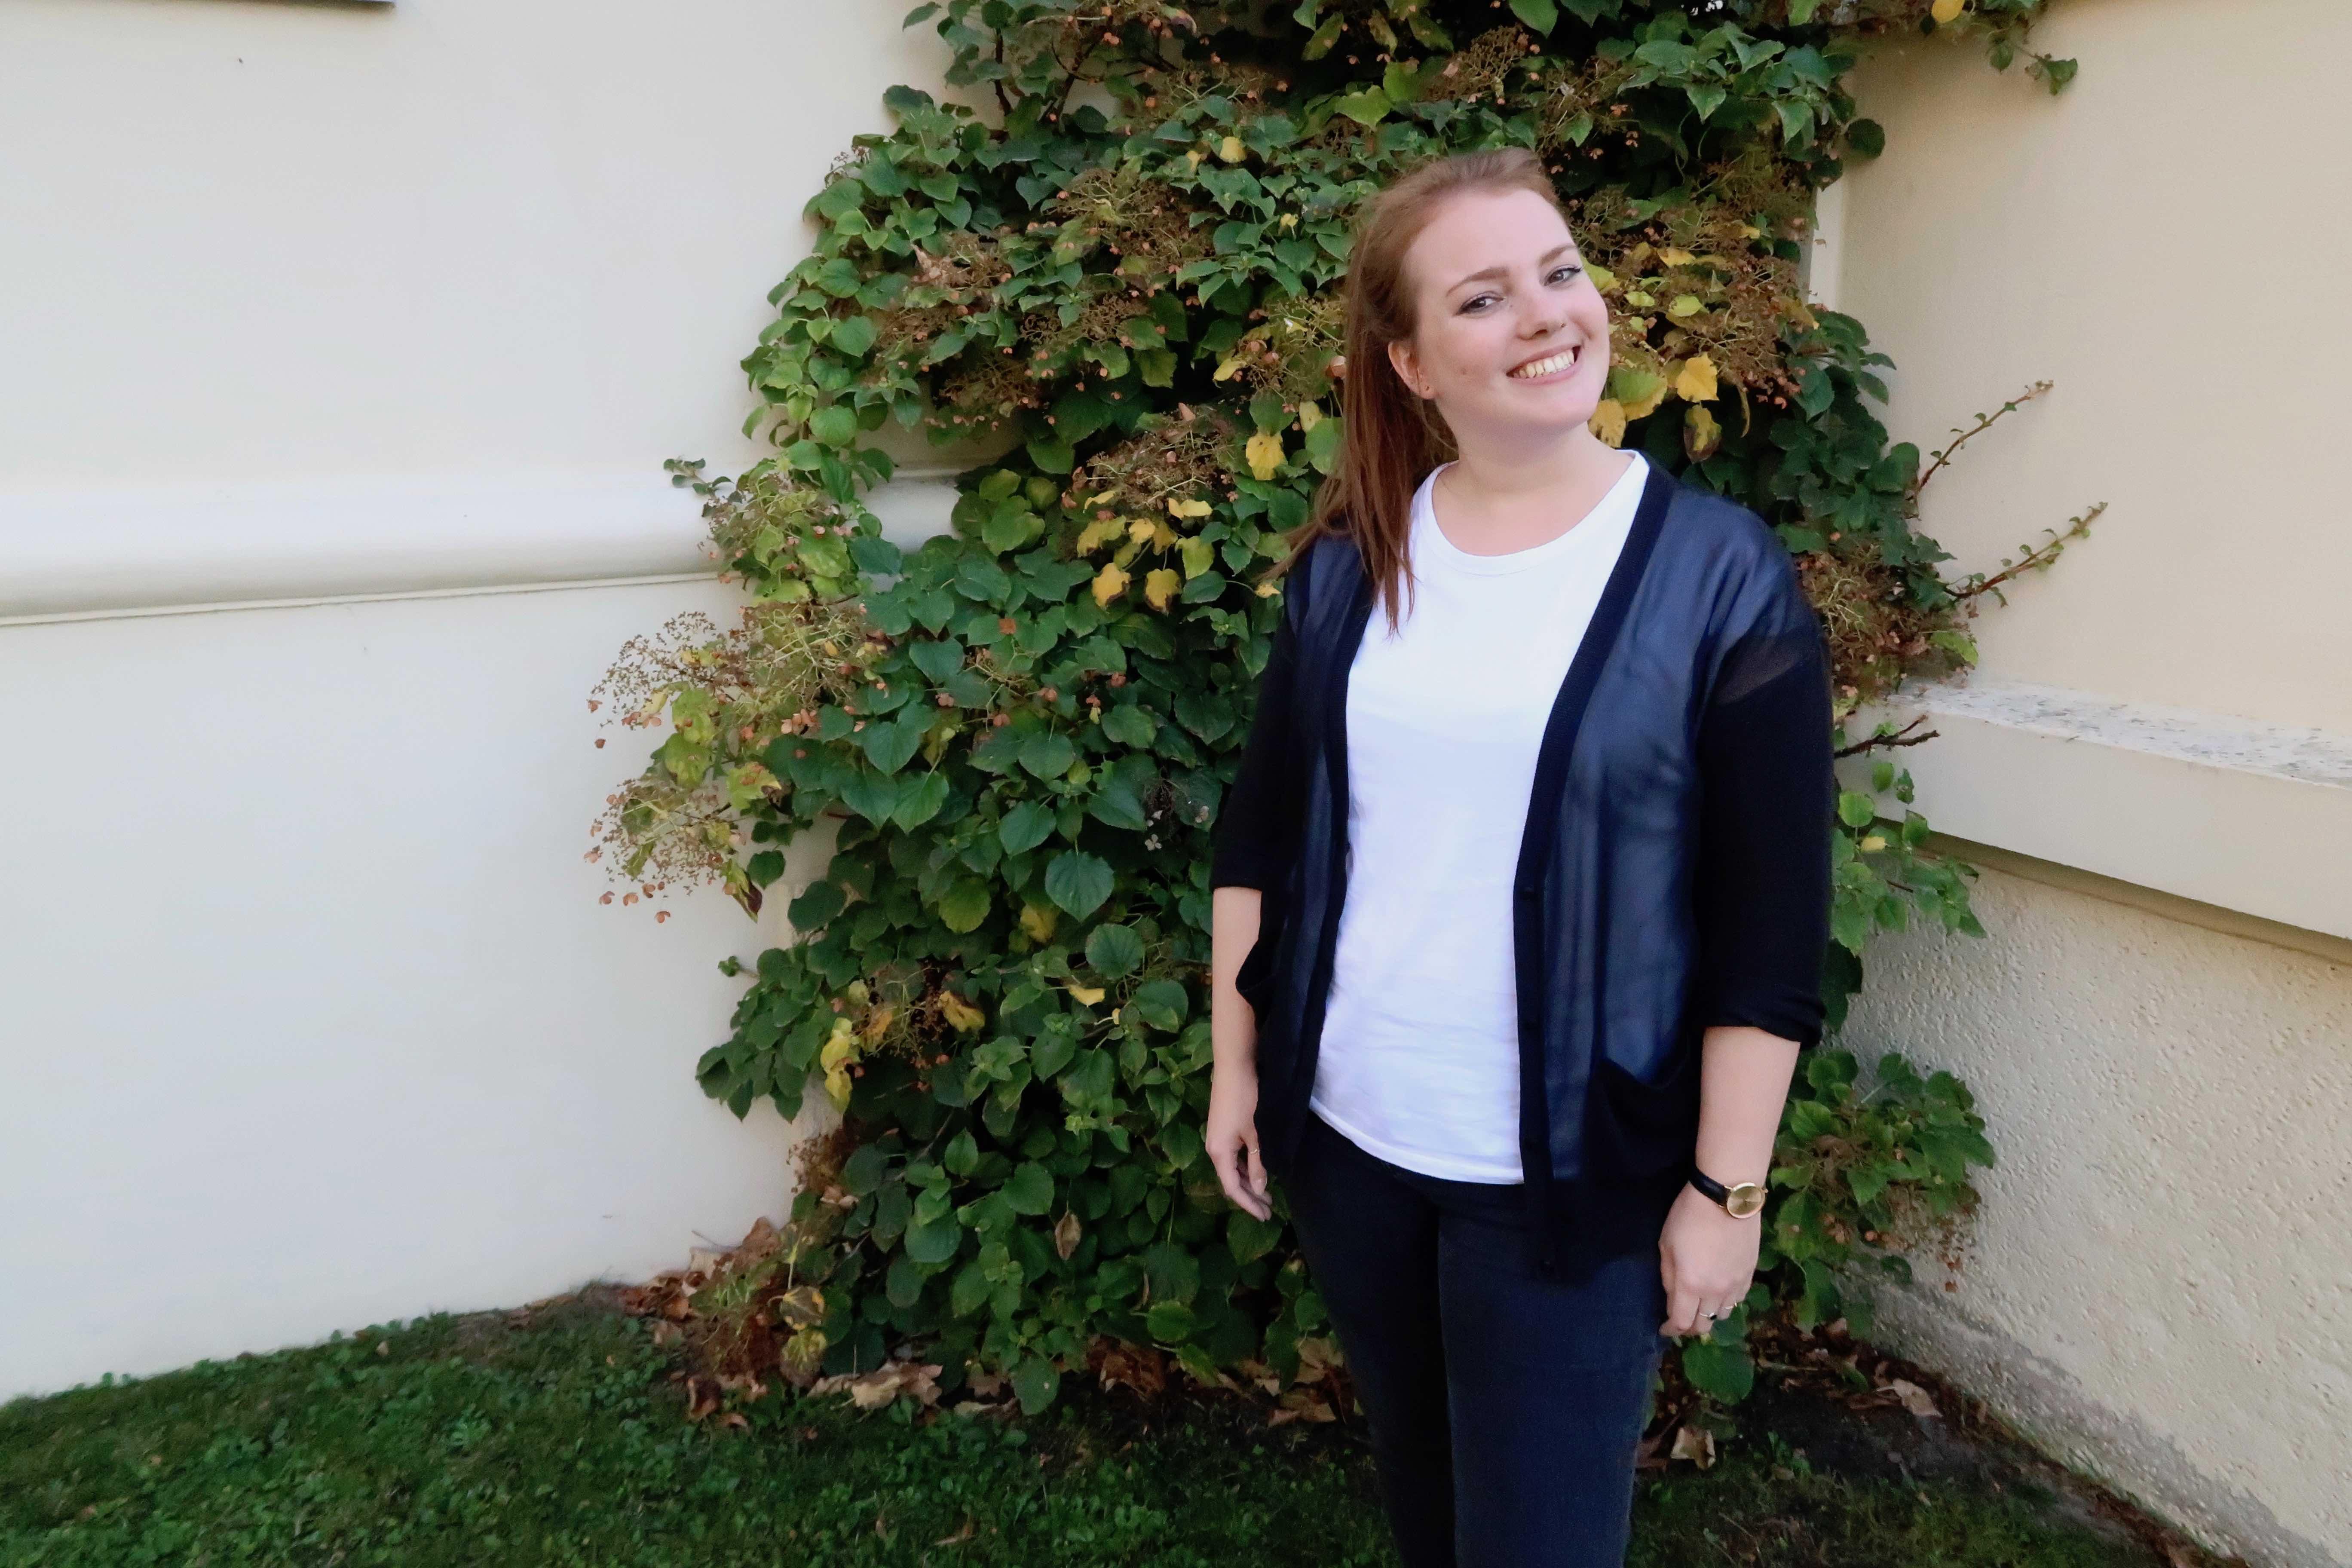 Mitarbeiterin des Monats: HANNAH